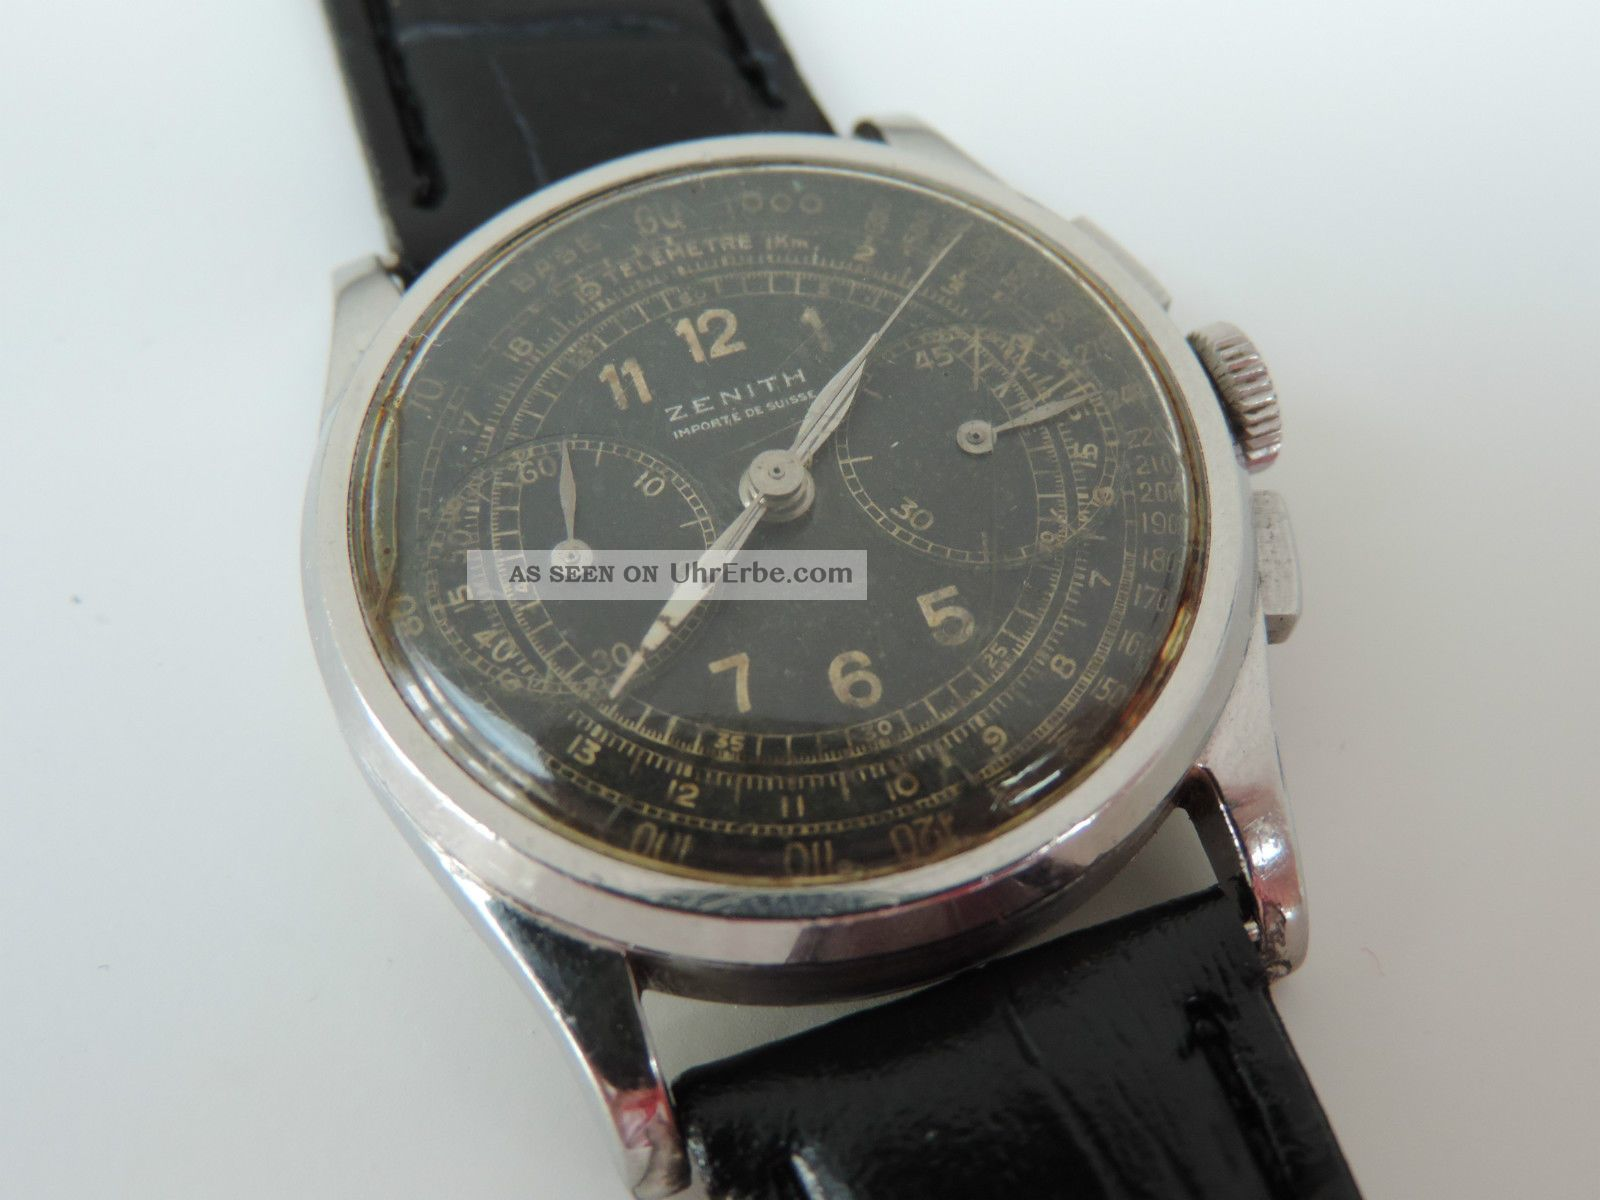 Zenith Vintage Military Chronograph - Kaliber 136 - Wk2 - Oder Wk1 - Extrem Rar Armbanduhren Bild